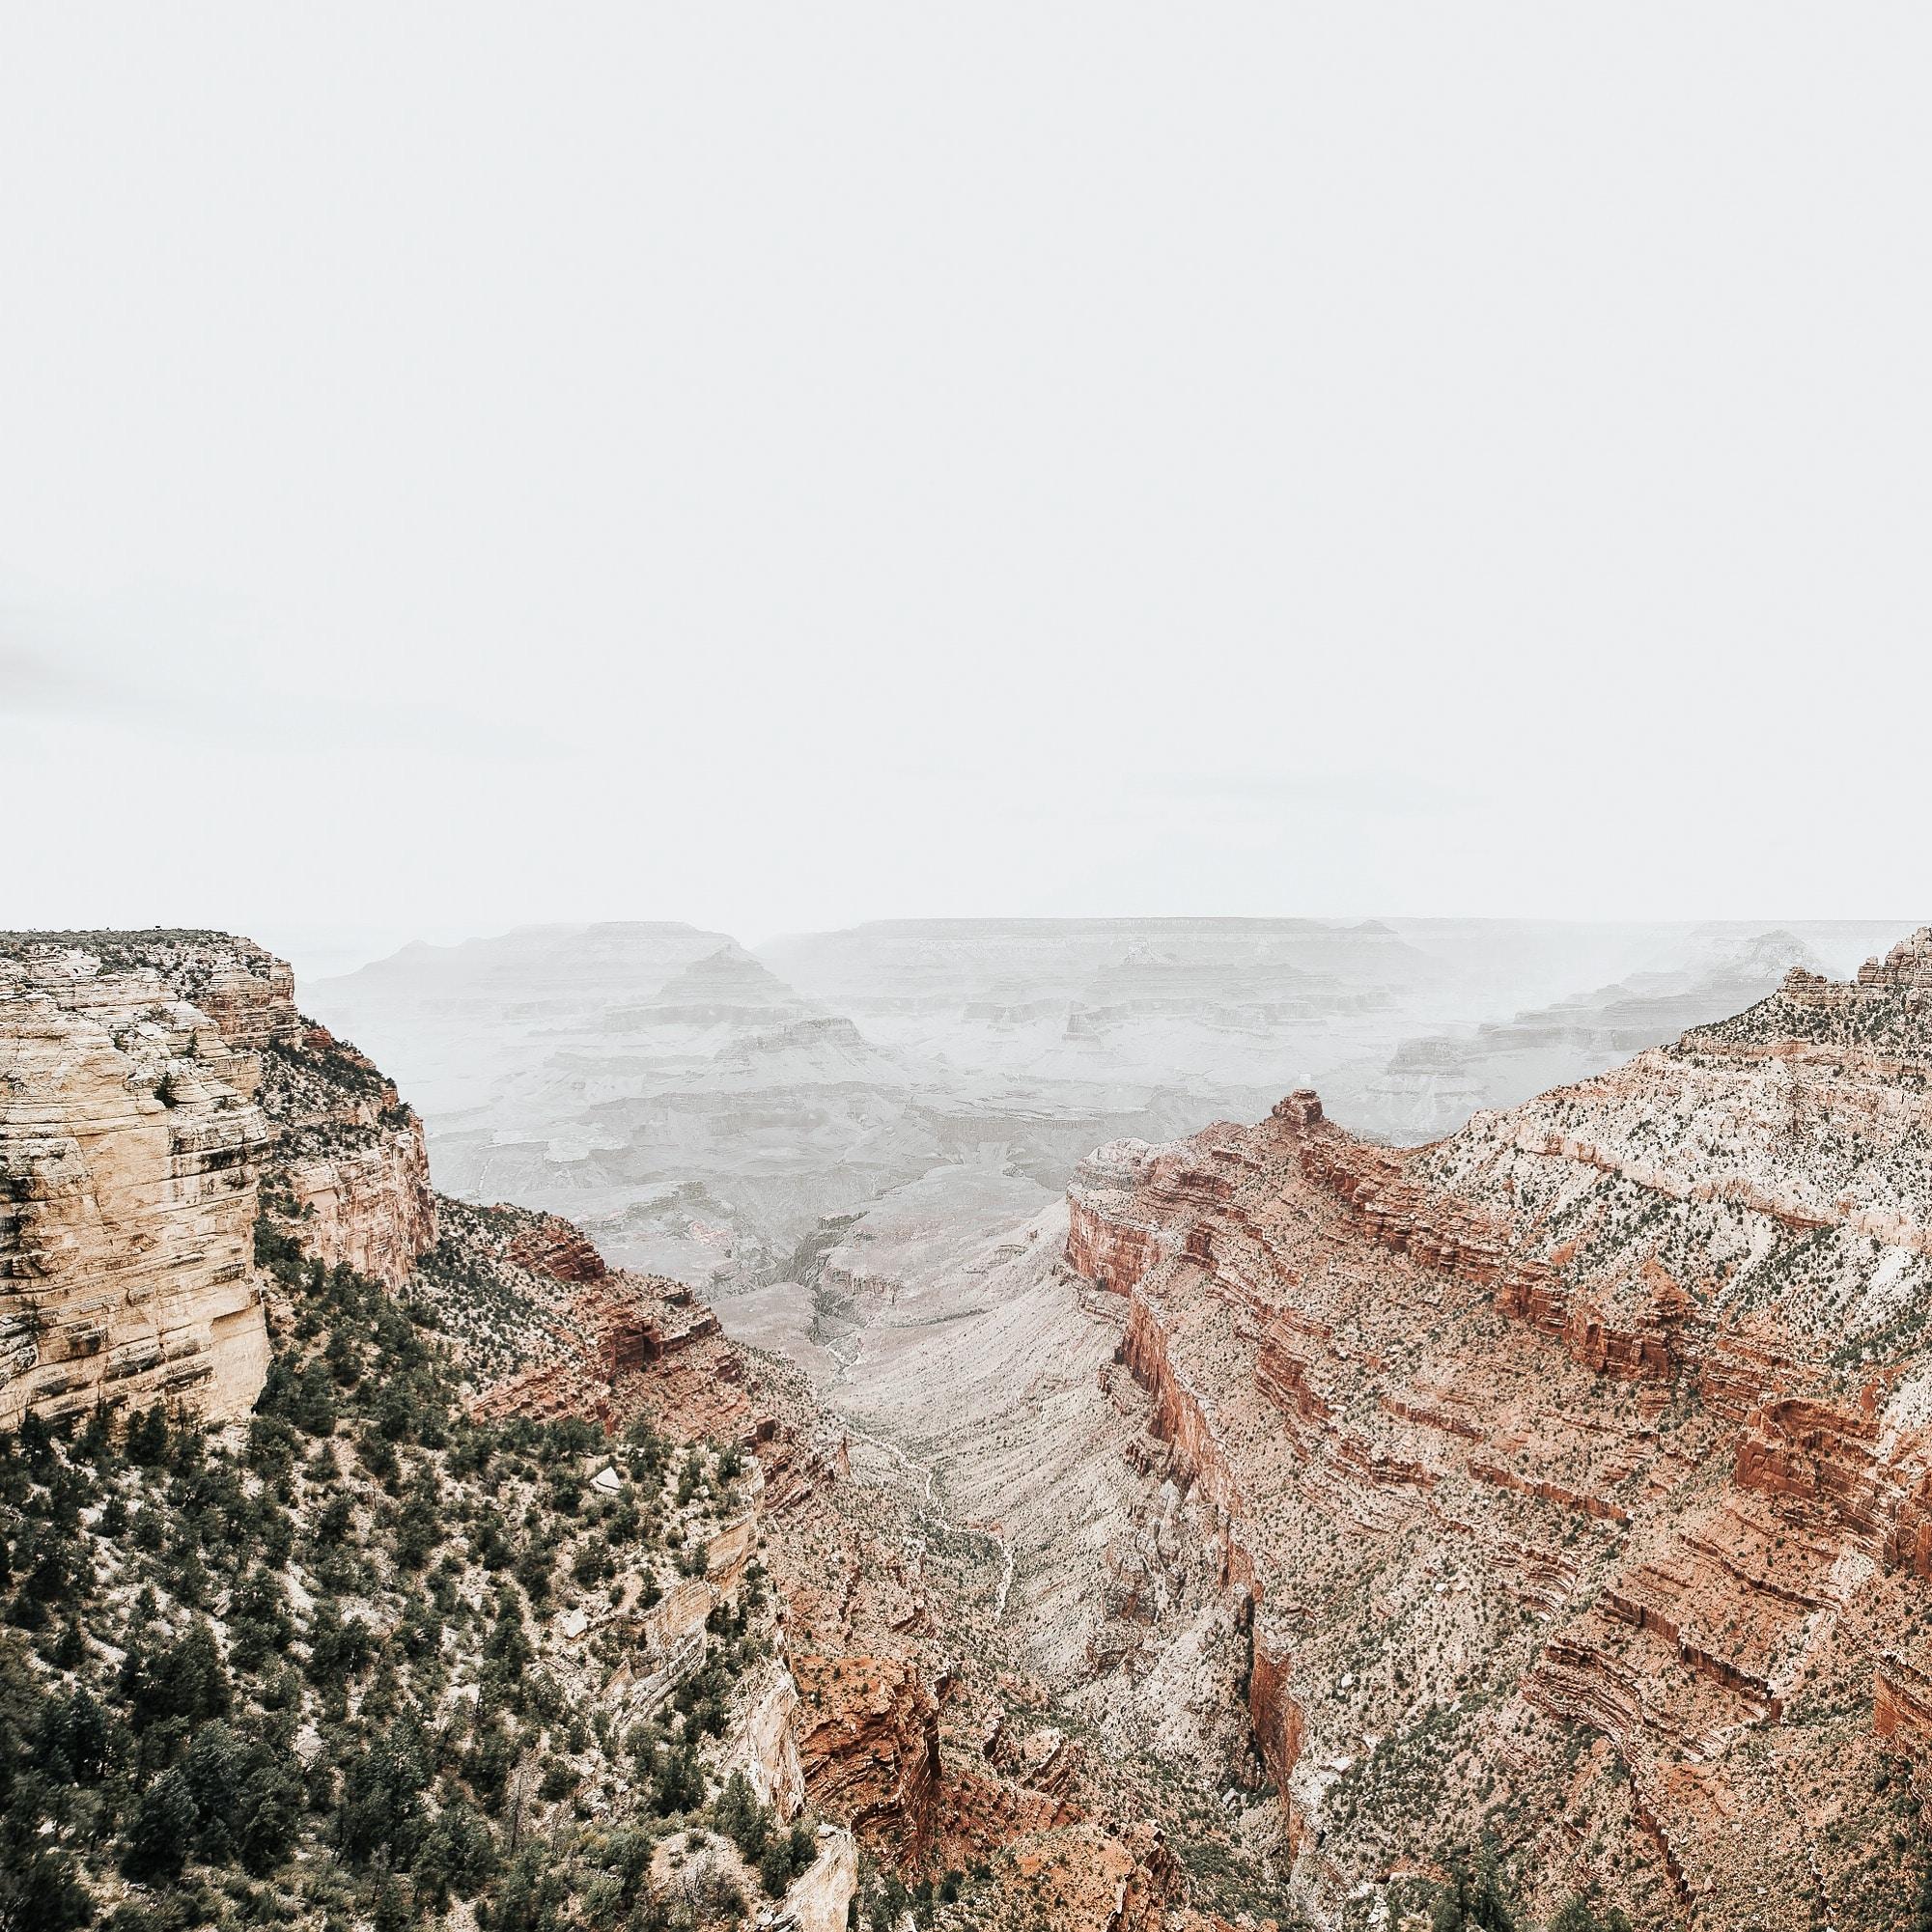 Overcast sky over the desert cliffs of Grand Canyon National Park